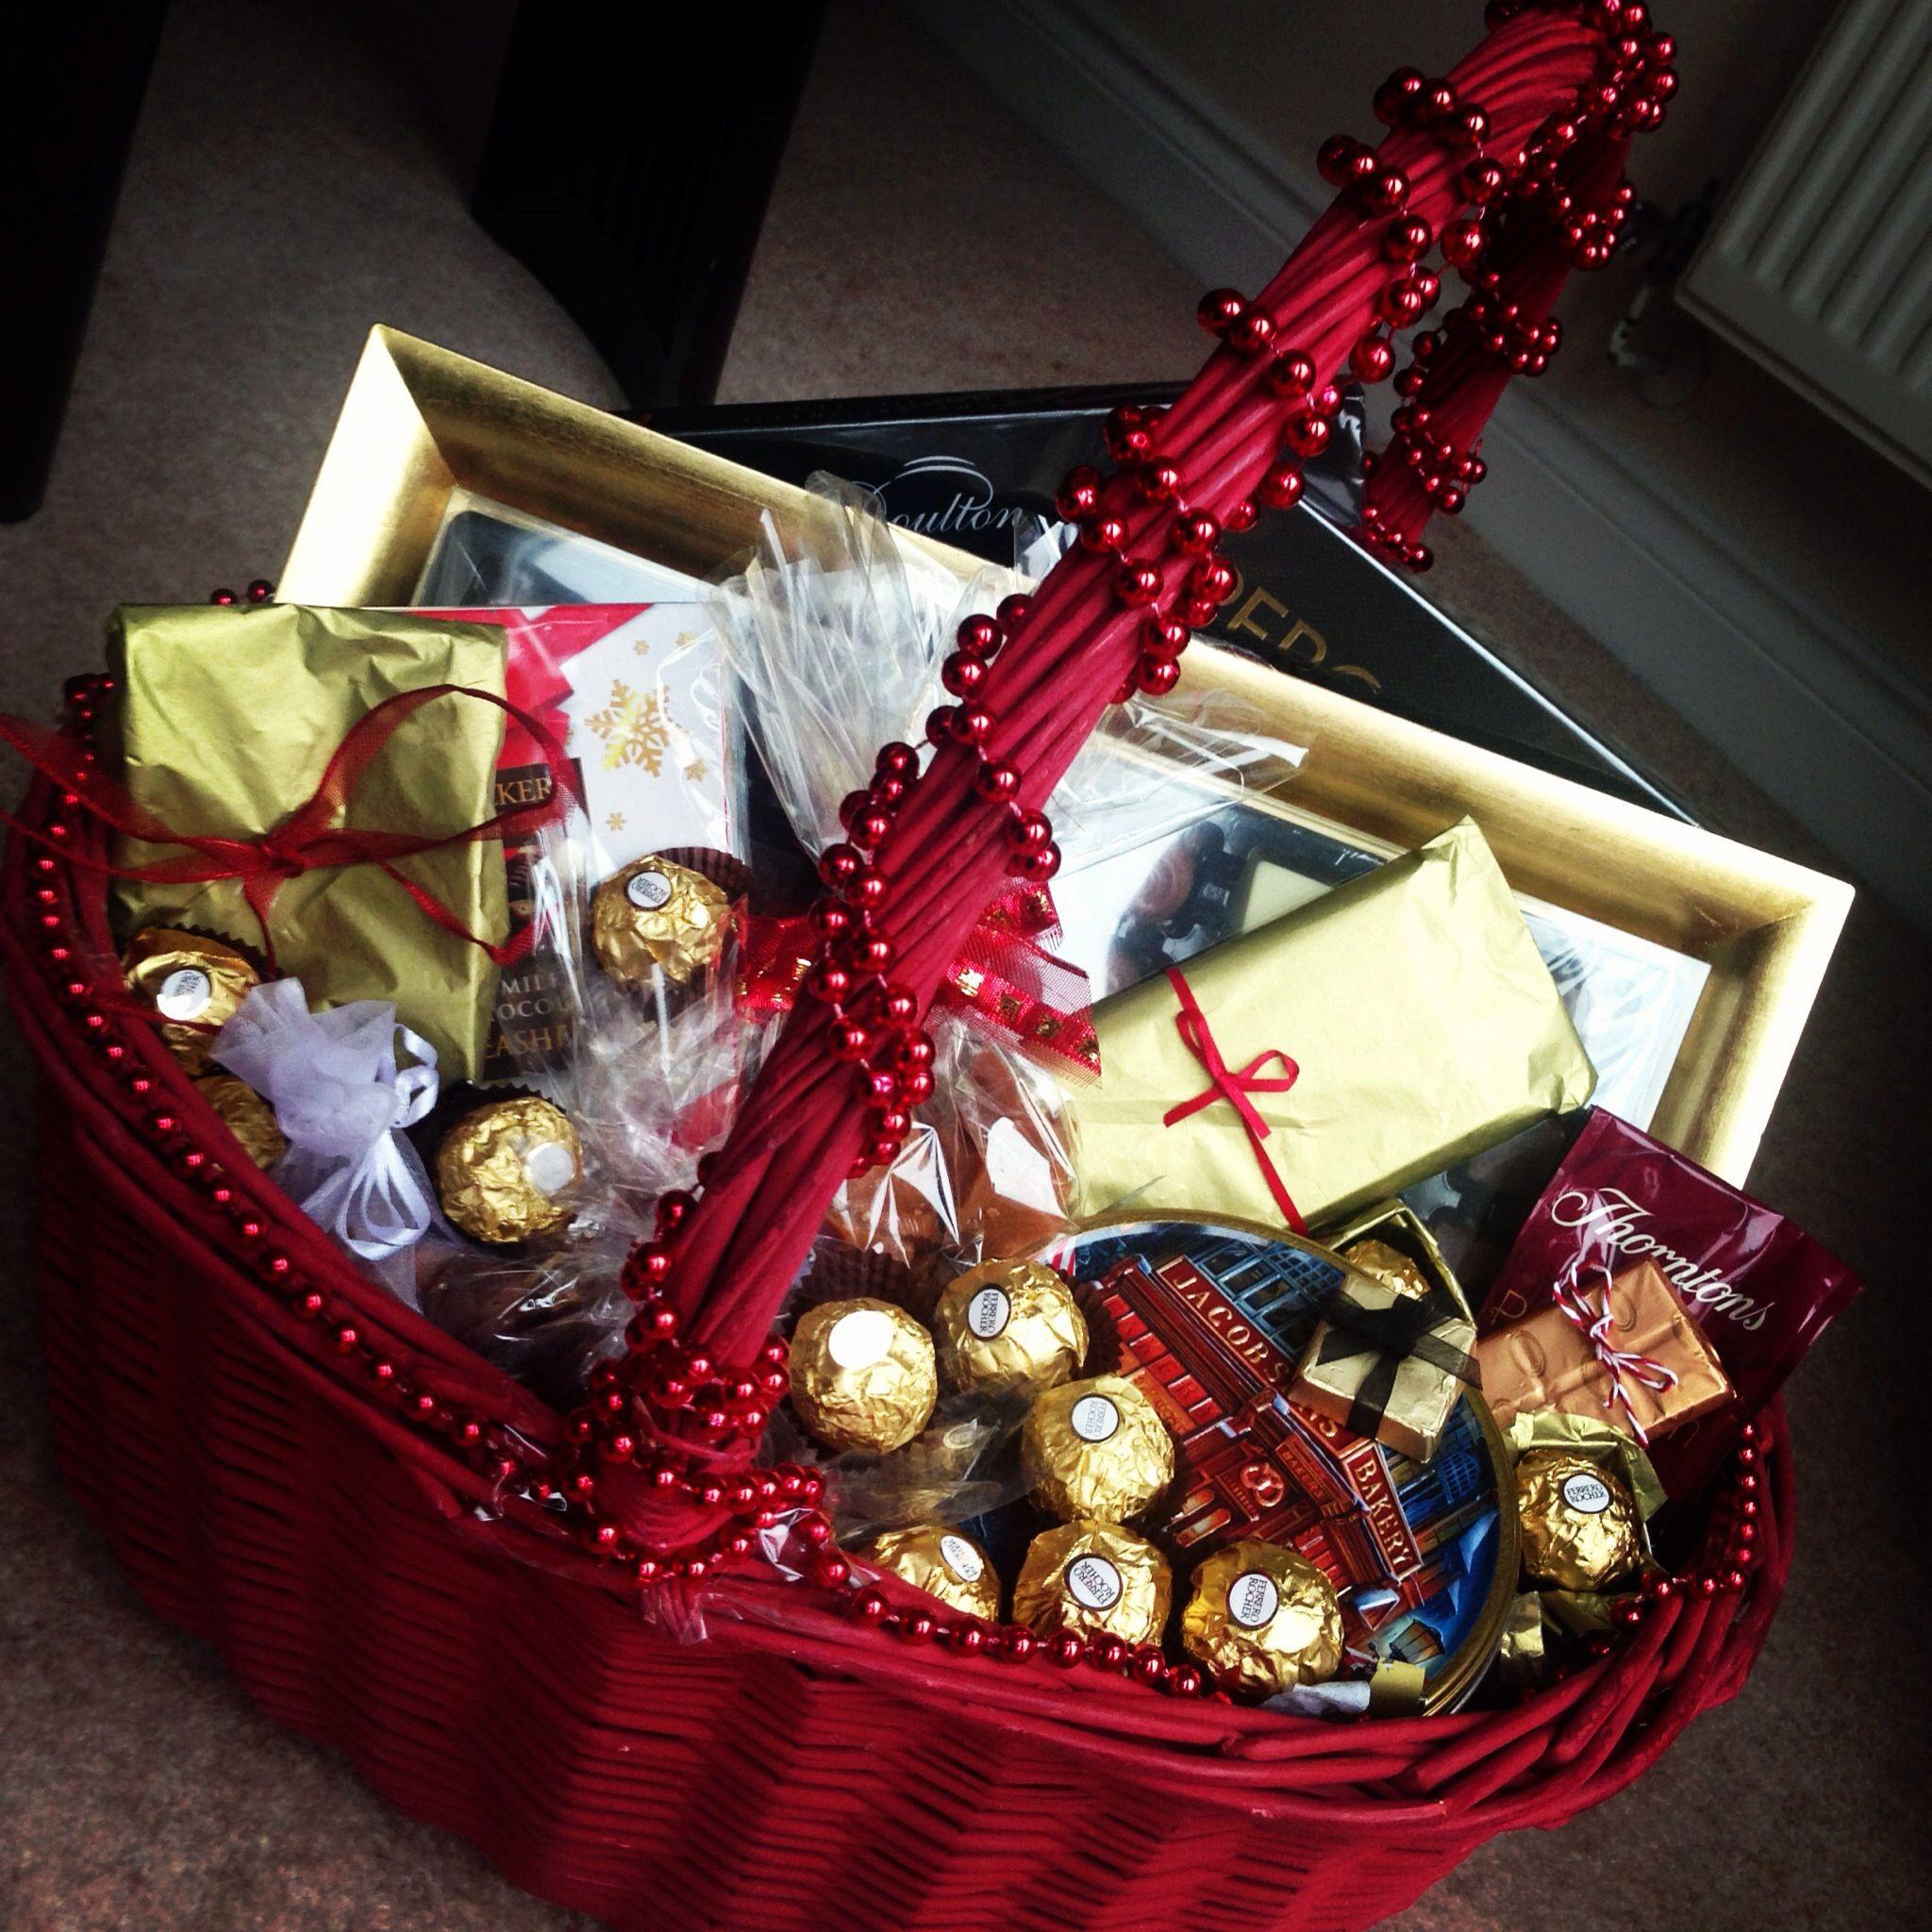 Chocolate Hamper Chocolate hampers, Christmas chocolate